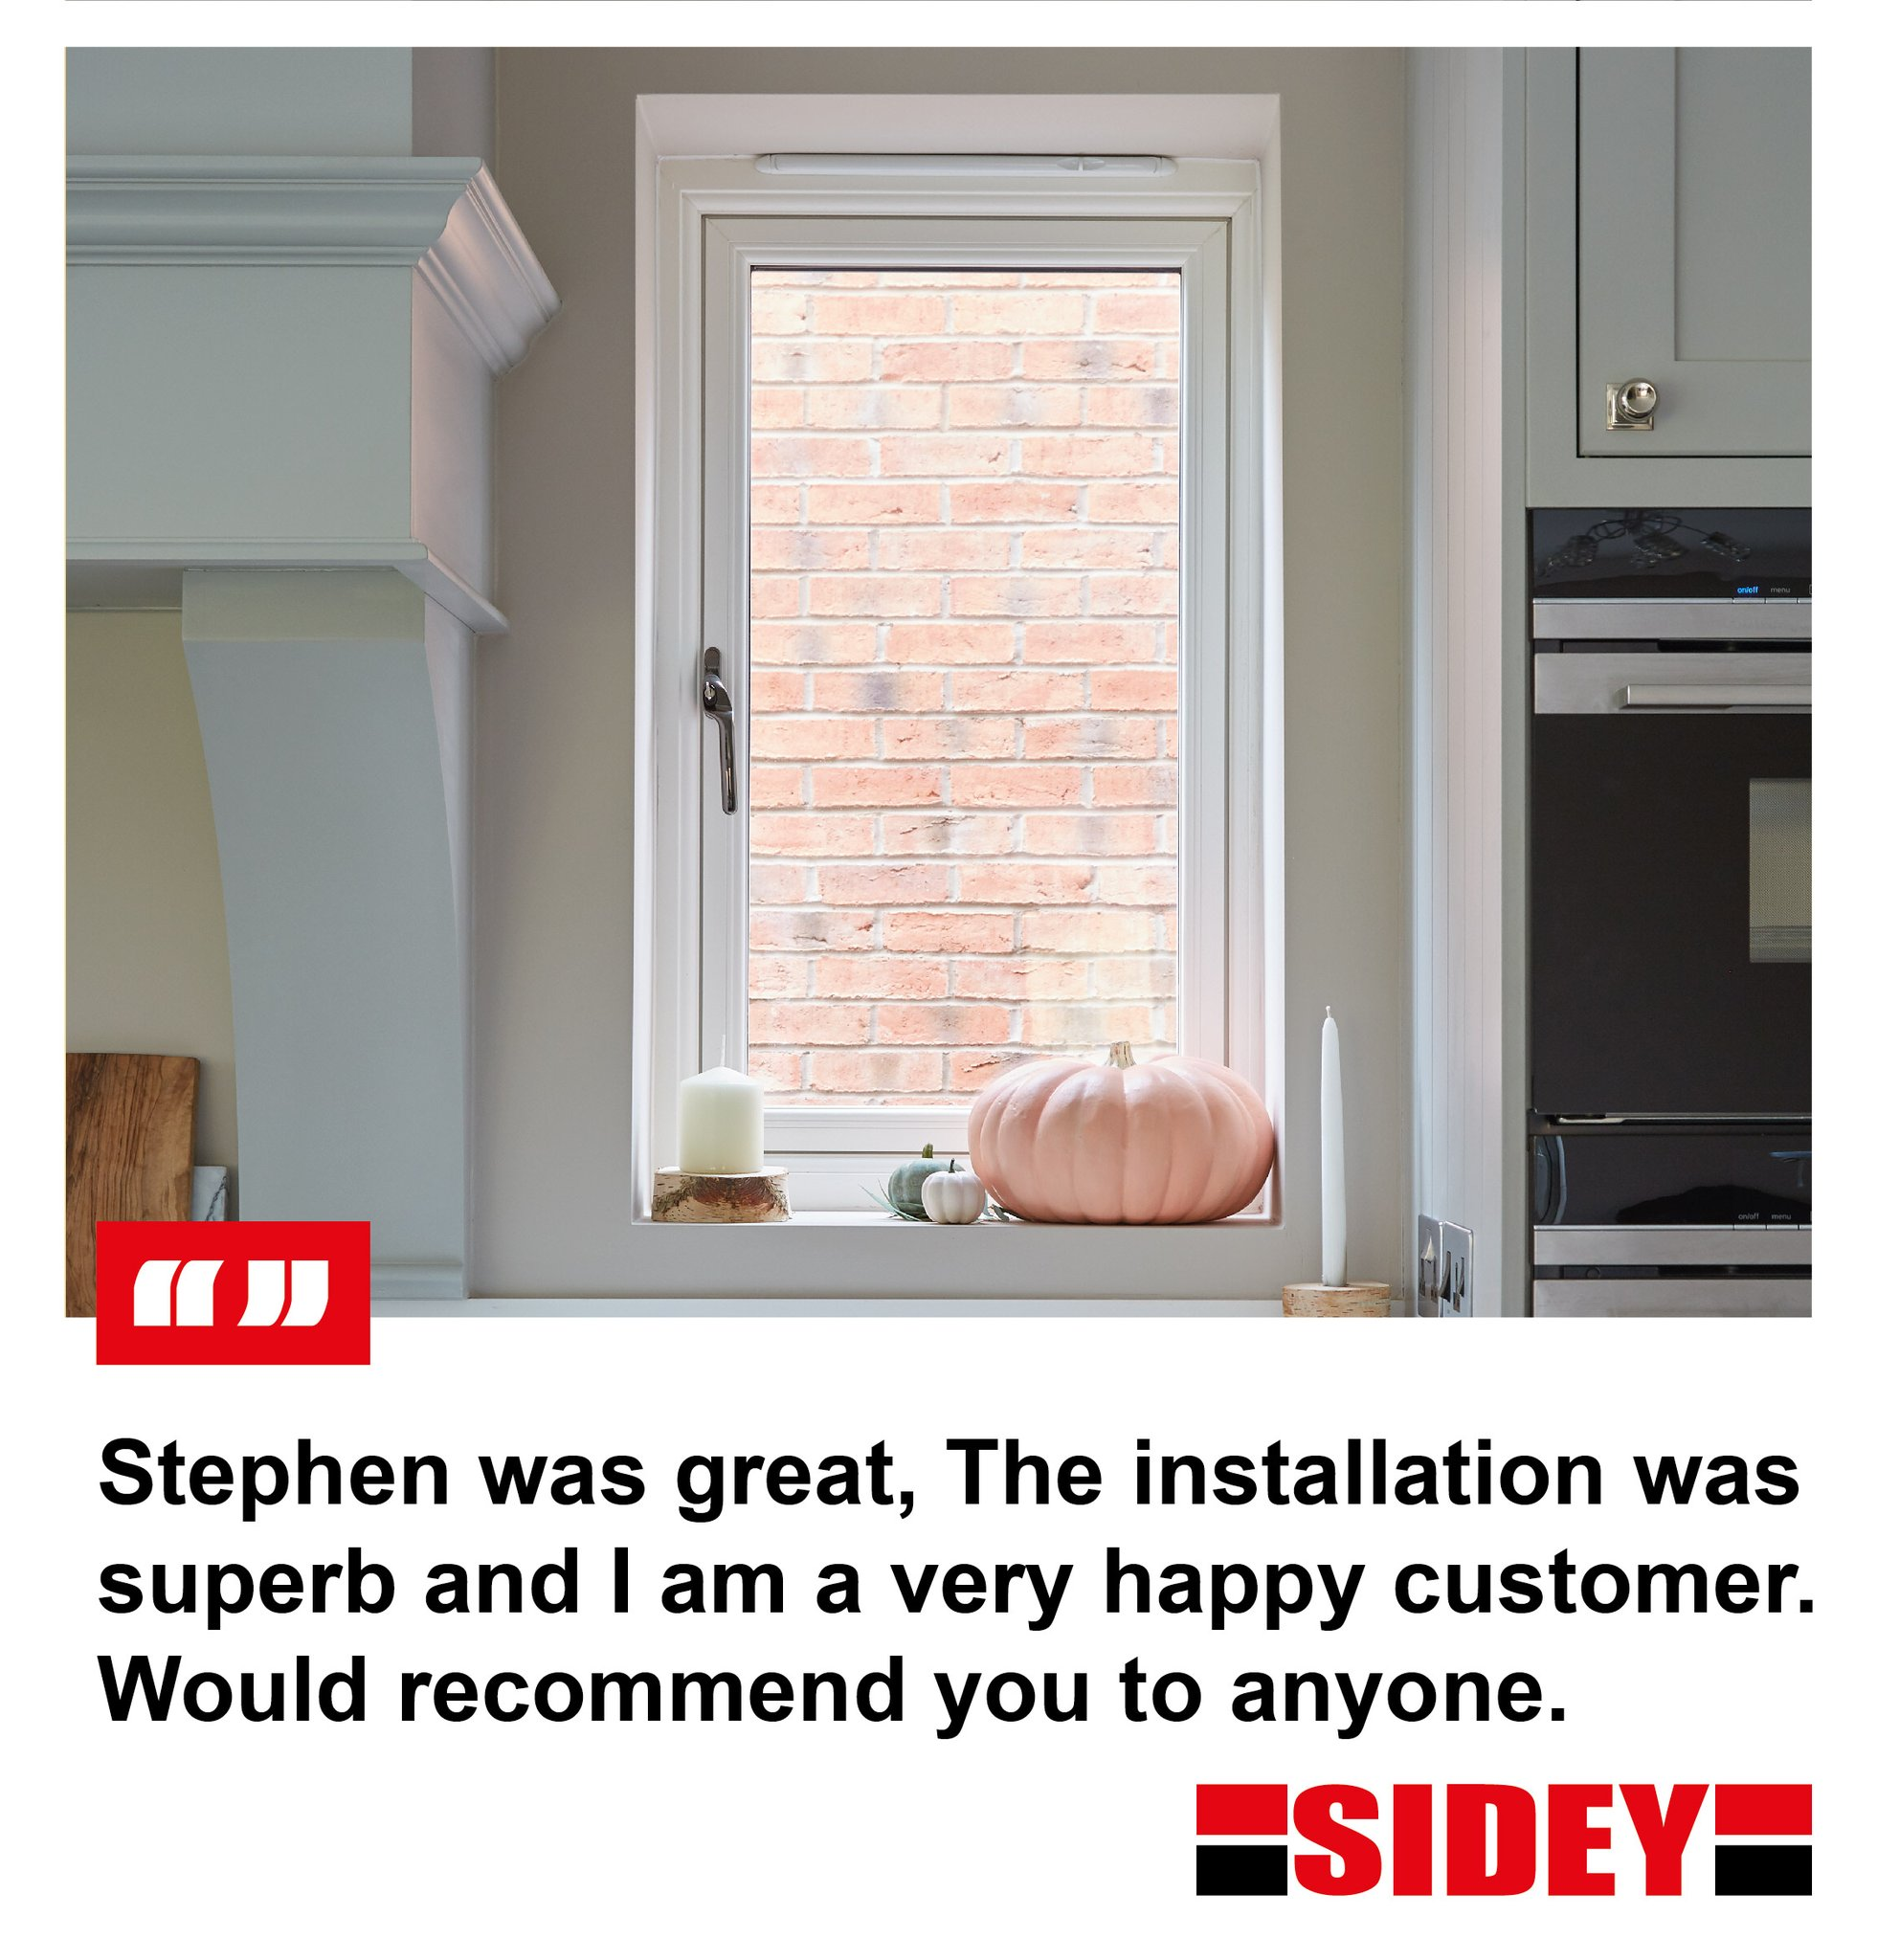 We appreciate your feedback!  #FeedbackFriday #Windows #Doors #Sidey https://t.co/CO5FfgV3kz